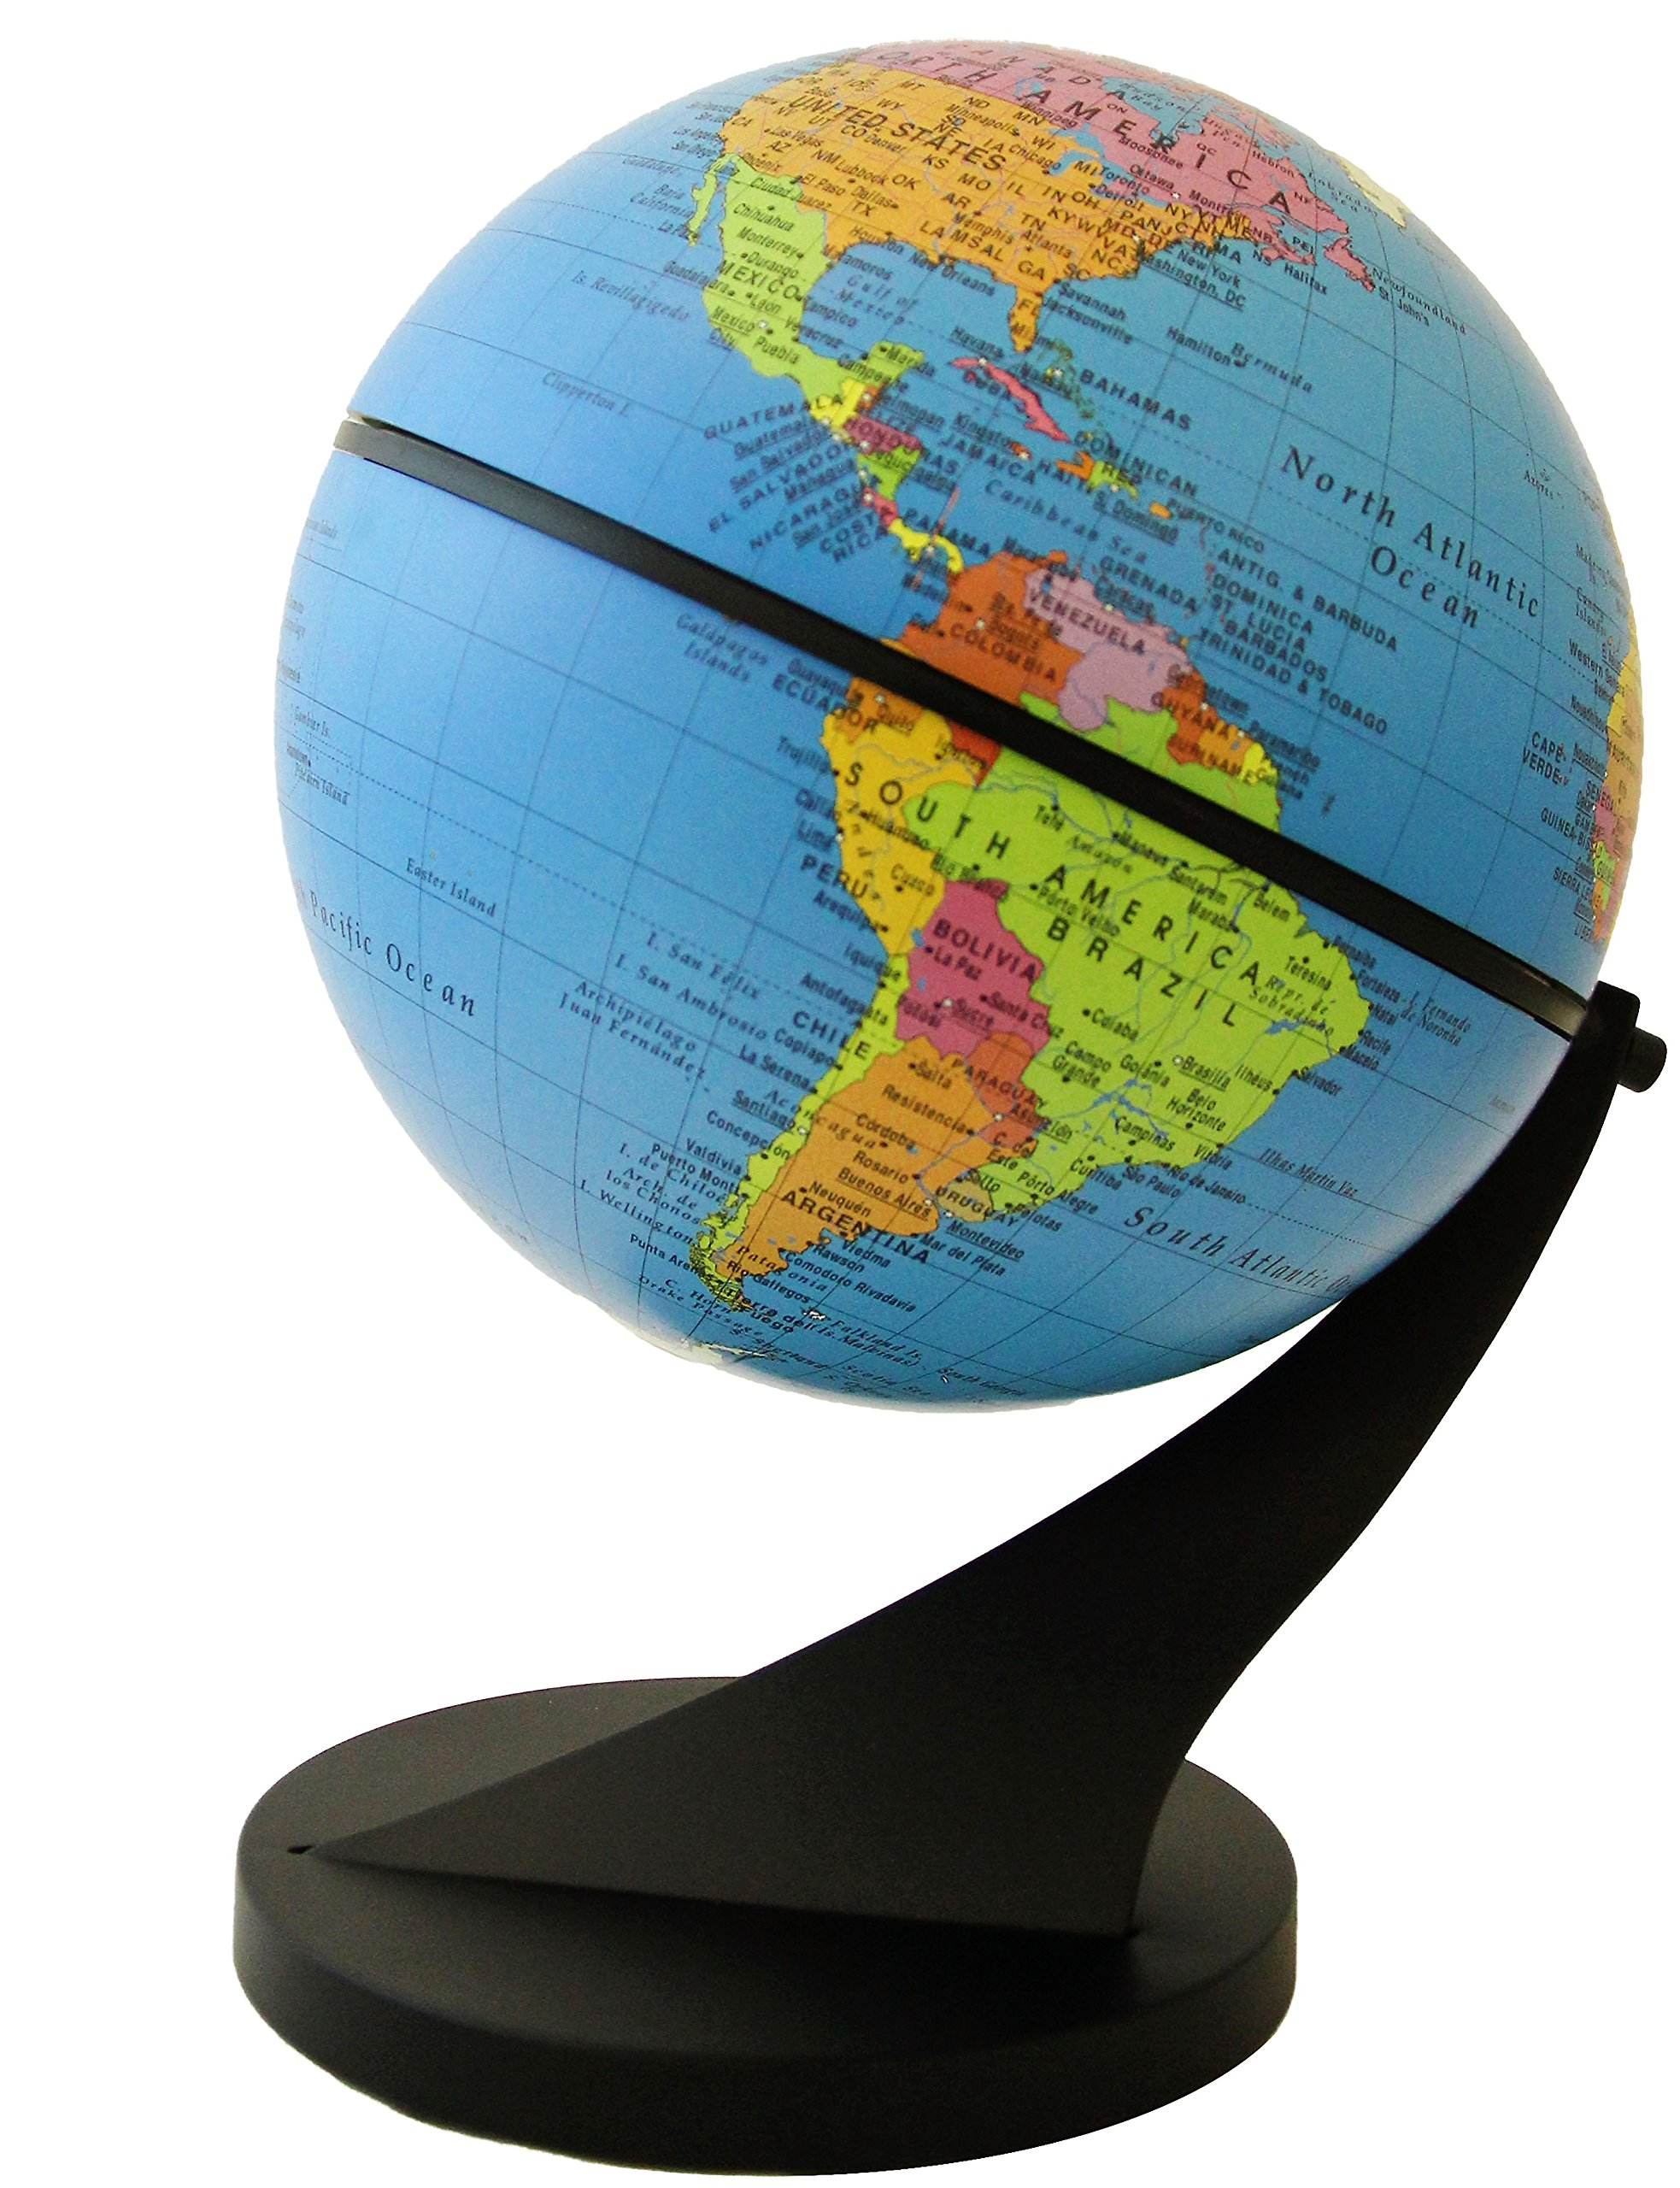 Stellanova Swivel and Tilt Globe - Interactive & Educational Children's Desktop Globe, Blue Ocean Political Map, Over 2,000 Place Names, Weighted Base (6''/15 cm diameter)